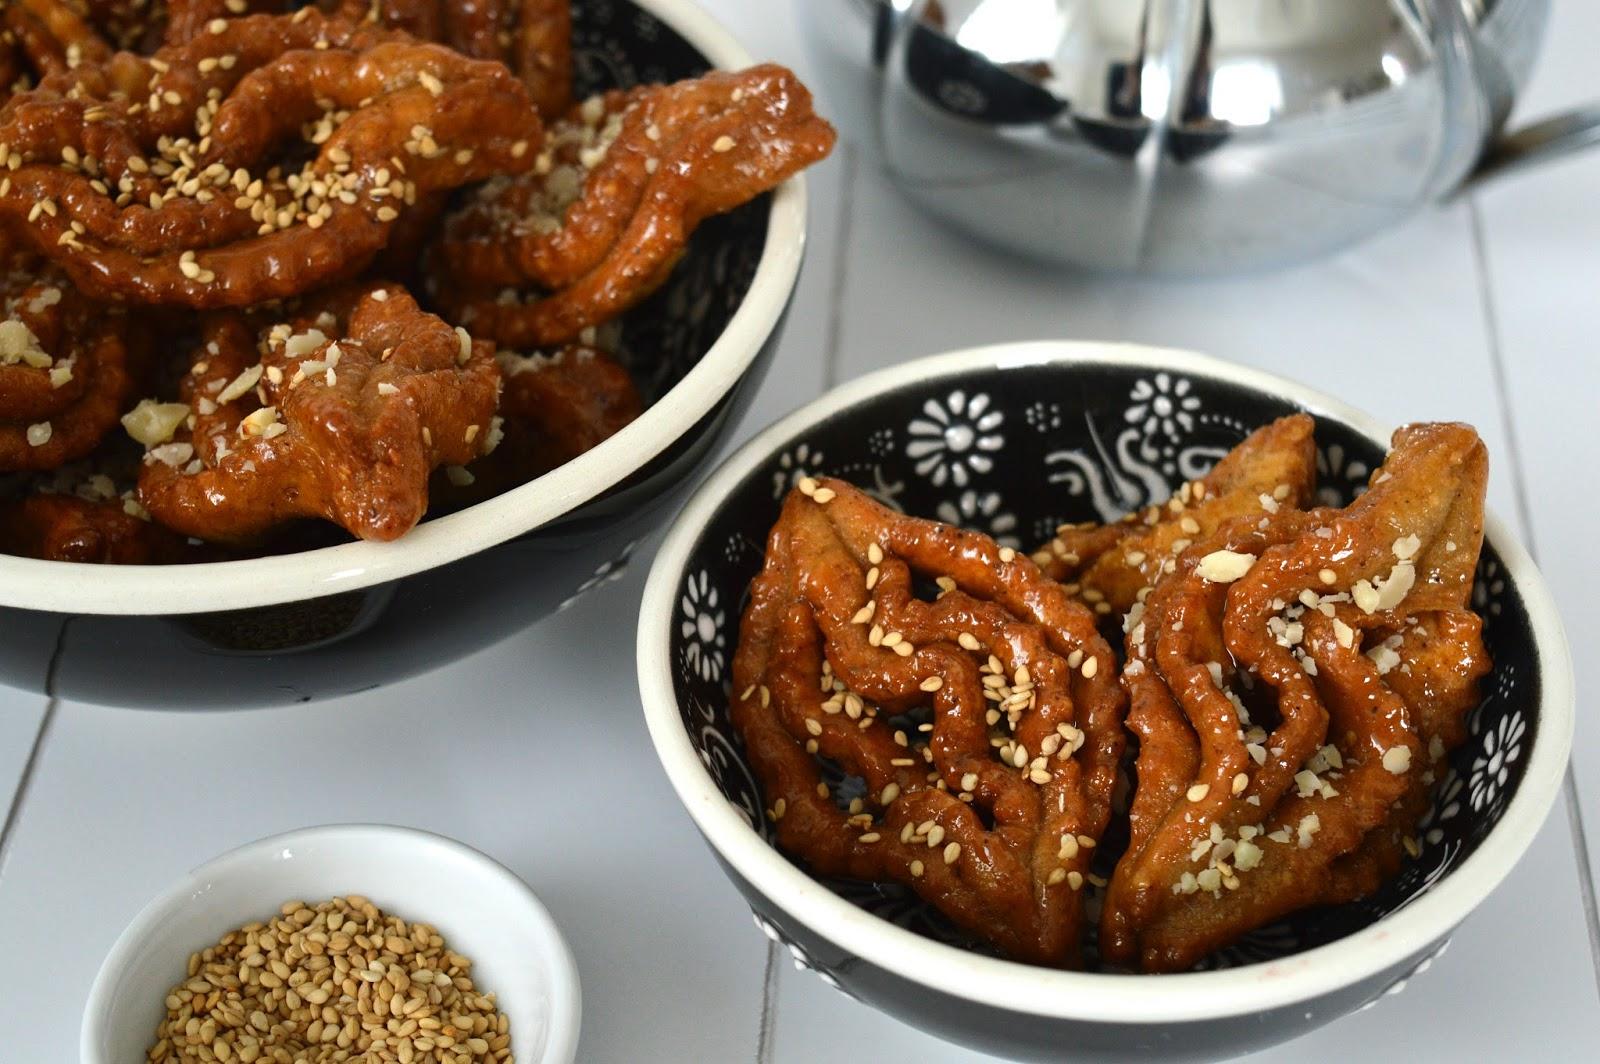 Ellouisa: Marokkaanse gerechten